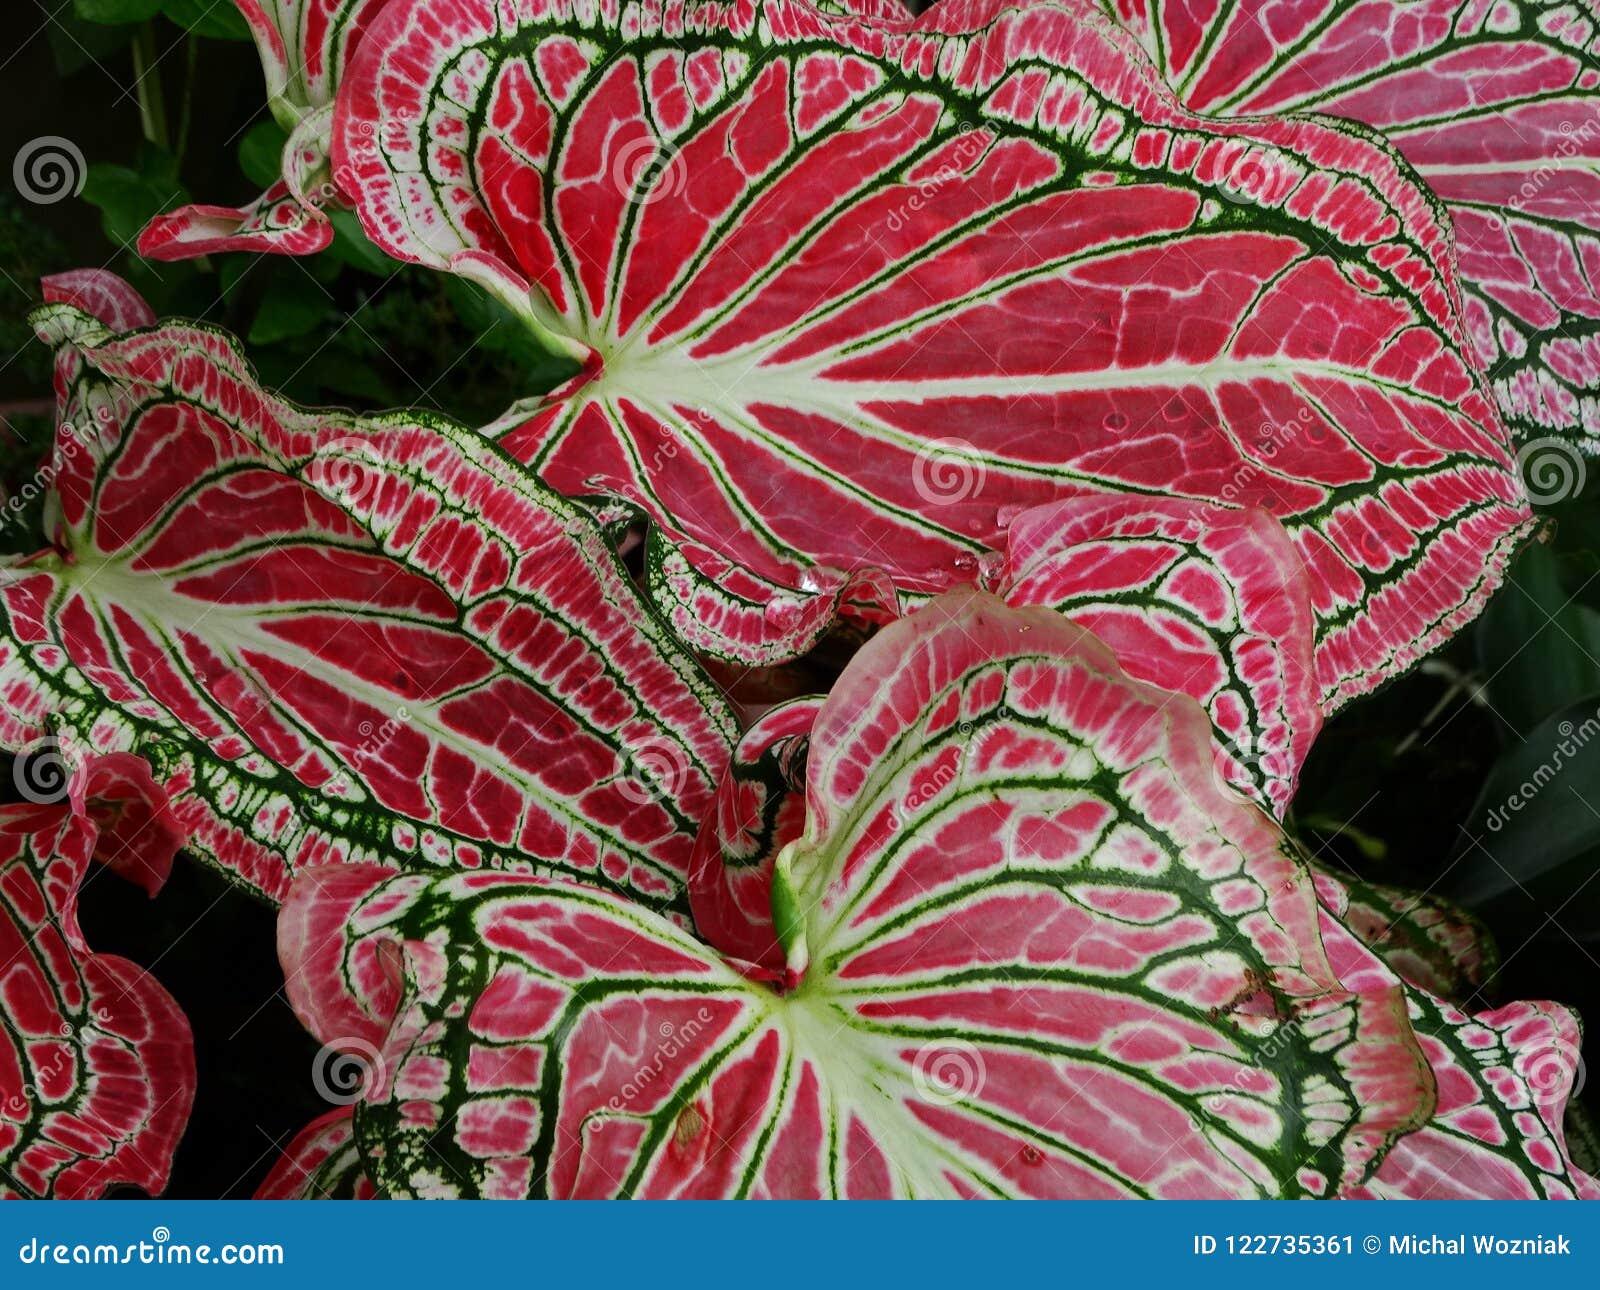 Pink Elephant Ear Caladium Candidum Leaves Stock Image Image Of Garden Green 122735361